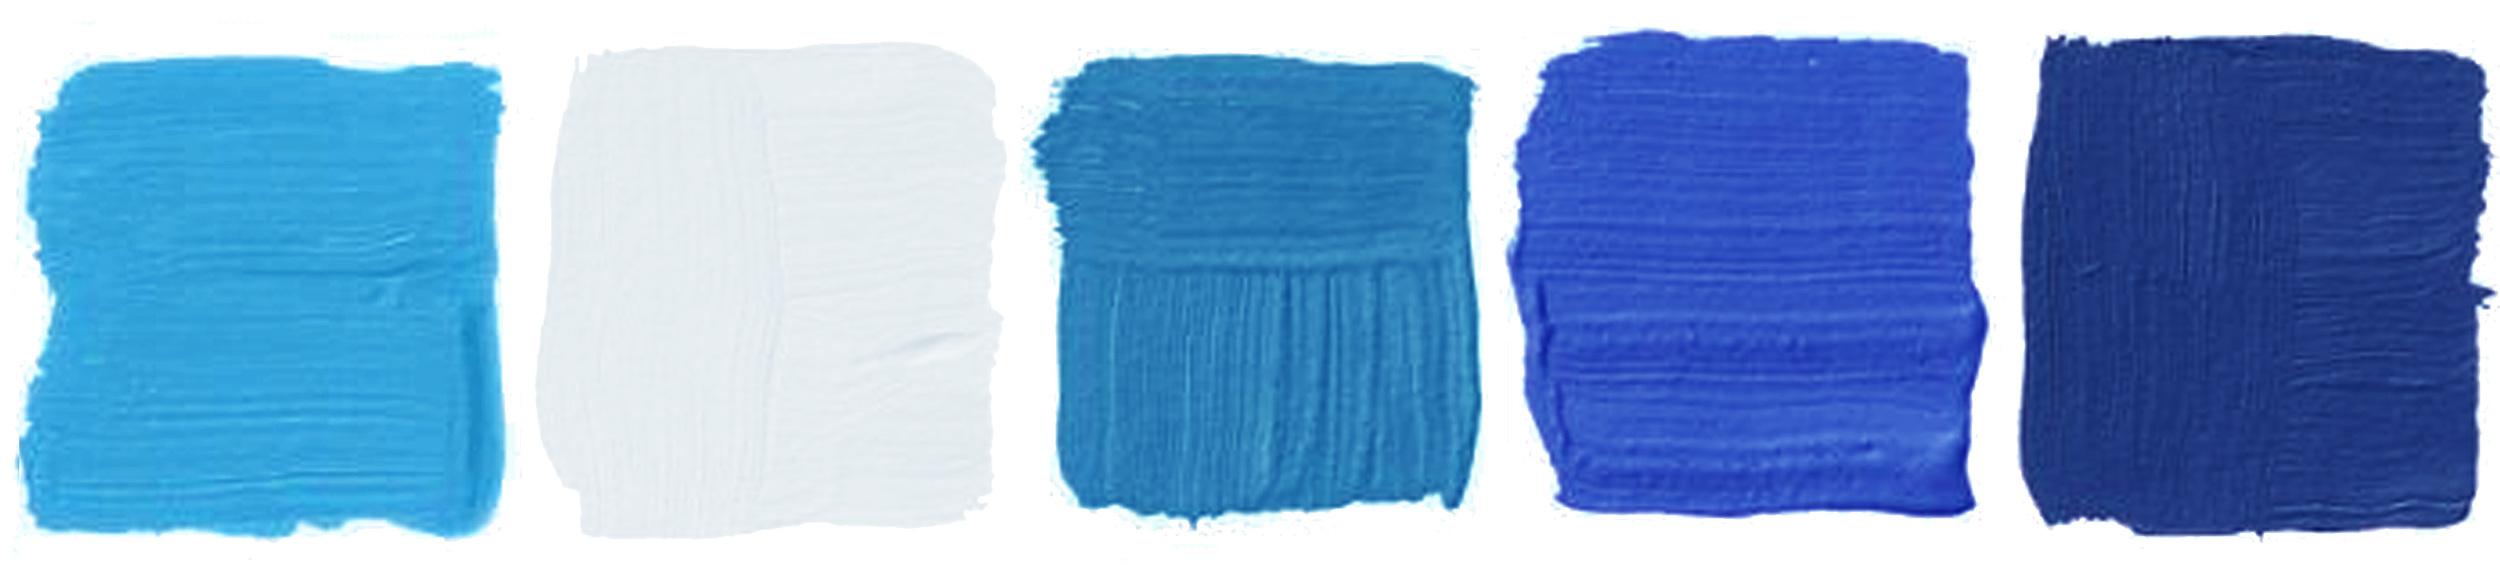 Benjamin Moore  Lake Tahoe  -  Simply White -  Laguna Blue  -  Delphinium  -  Admiral Blue